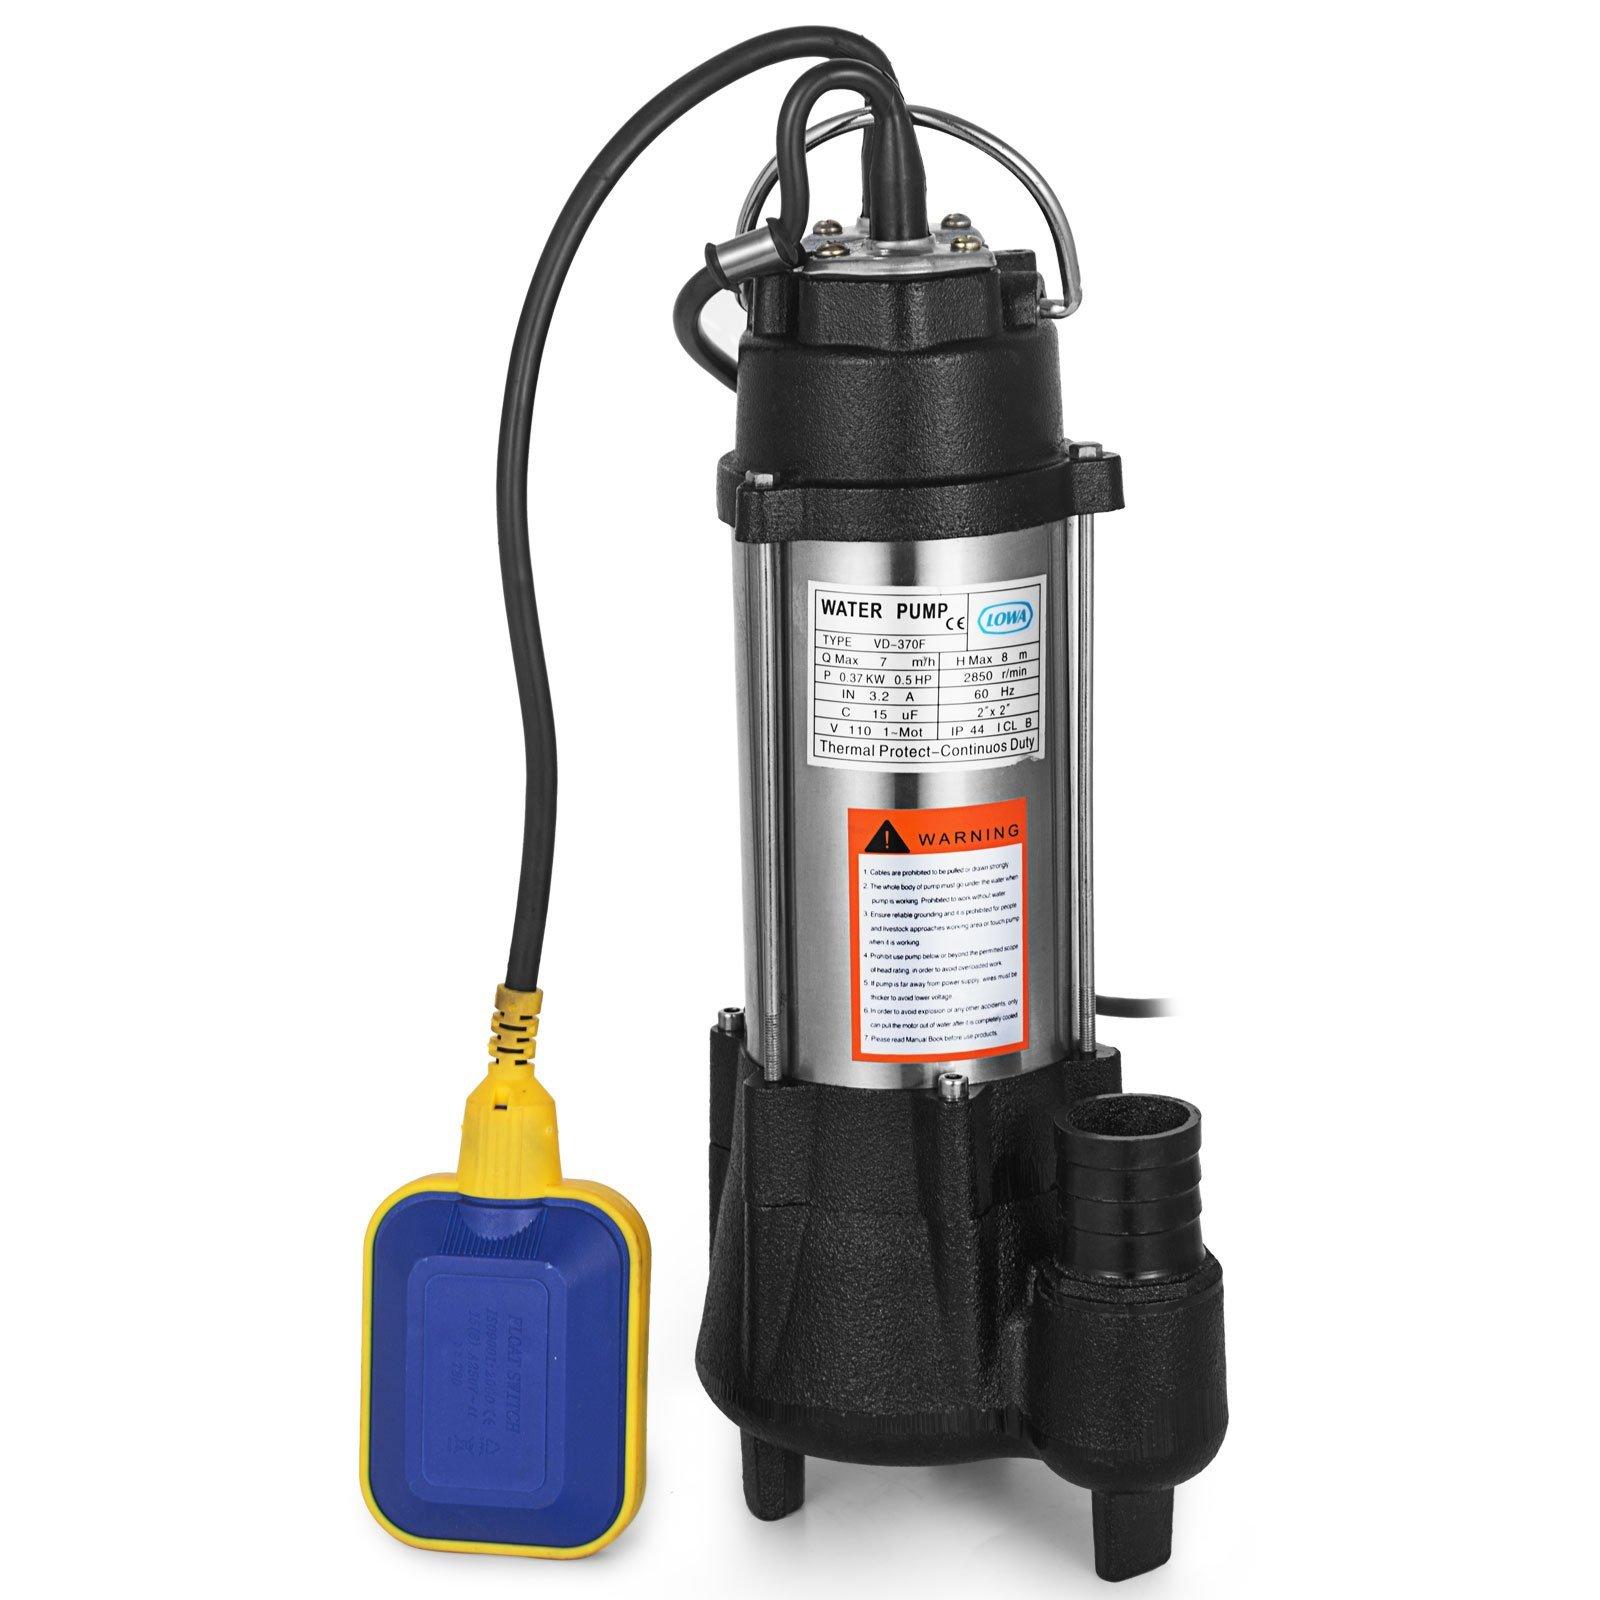 Vinbero 110V 1/2HP Sewage Pump 304SS 26FT Max Head Lift 3170 GPH Max Flow Pump With 20FT Cable & Plug Heavy Duty Cast steel Sewage Pump